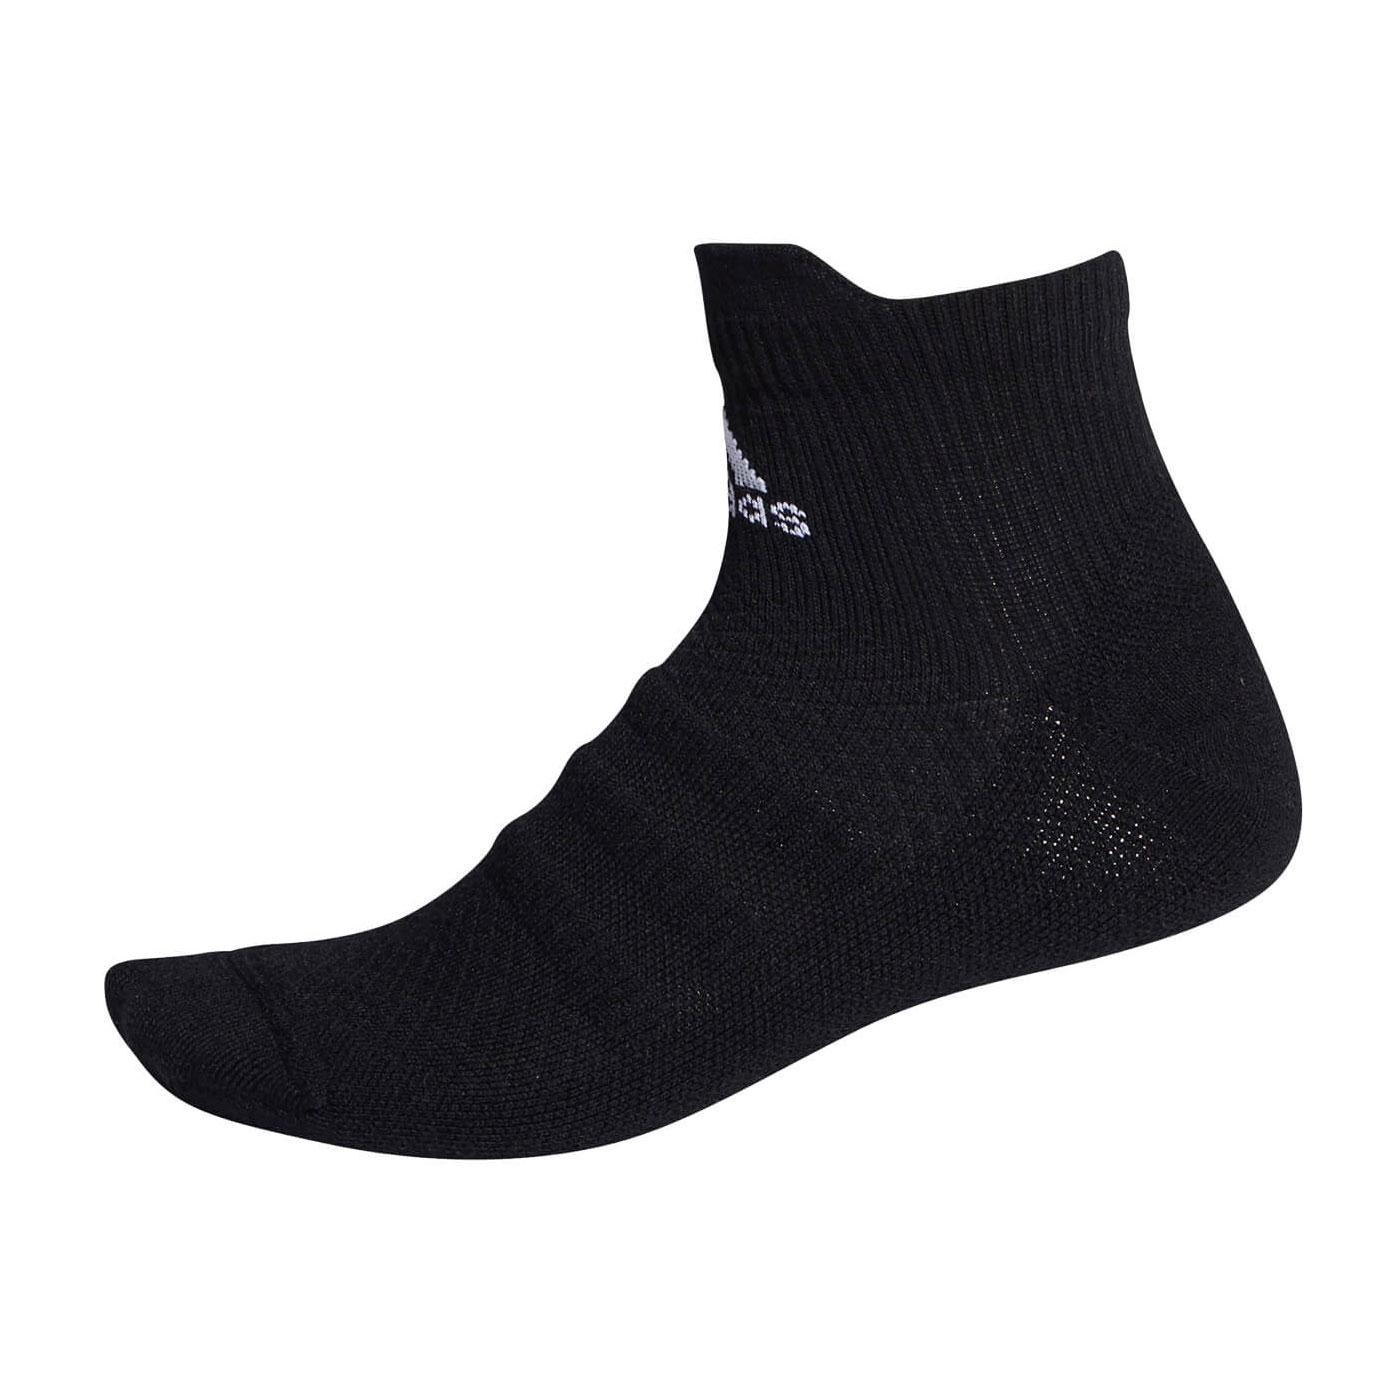 ADIDAS 襪子 FK0962